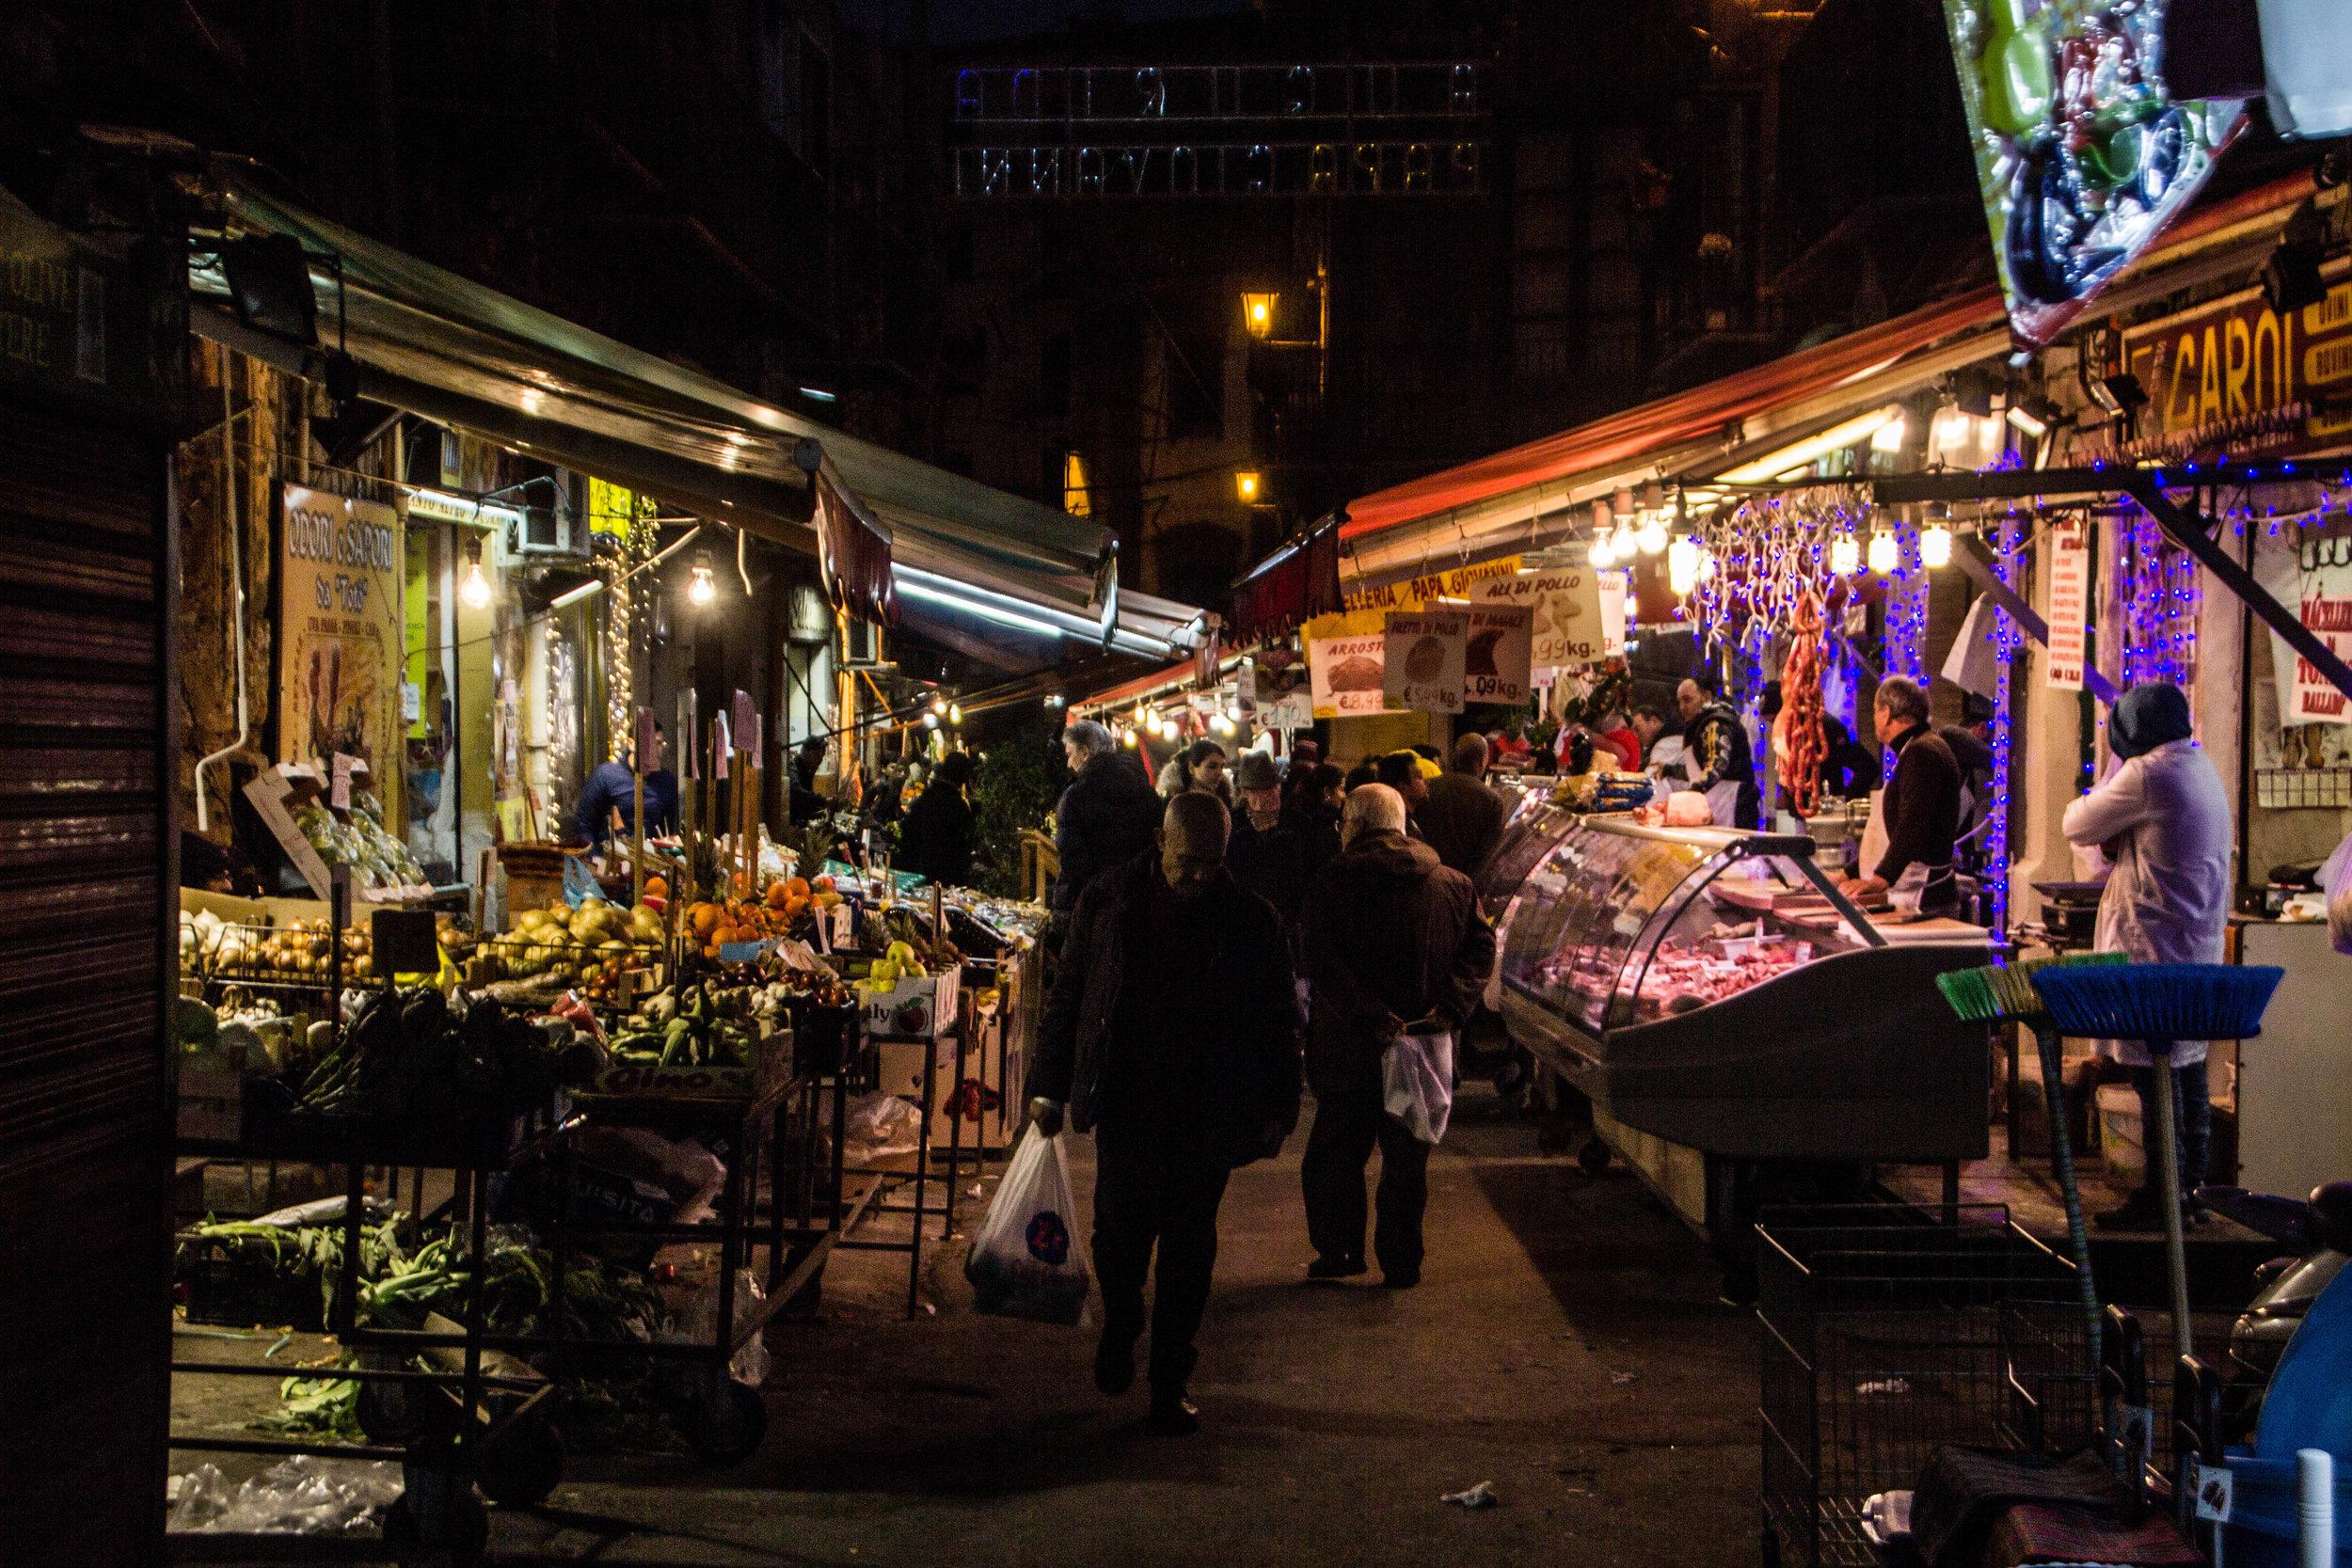 night-street-market-palermo-sicily-6.jpg